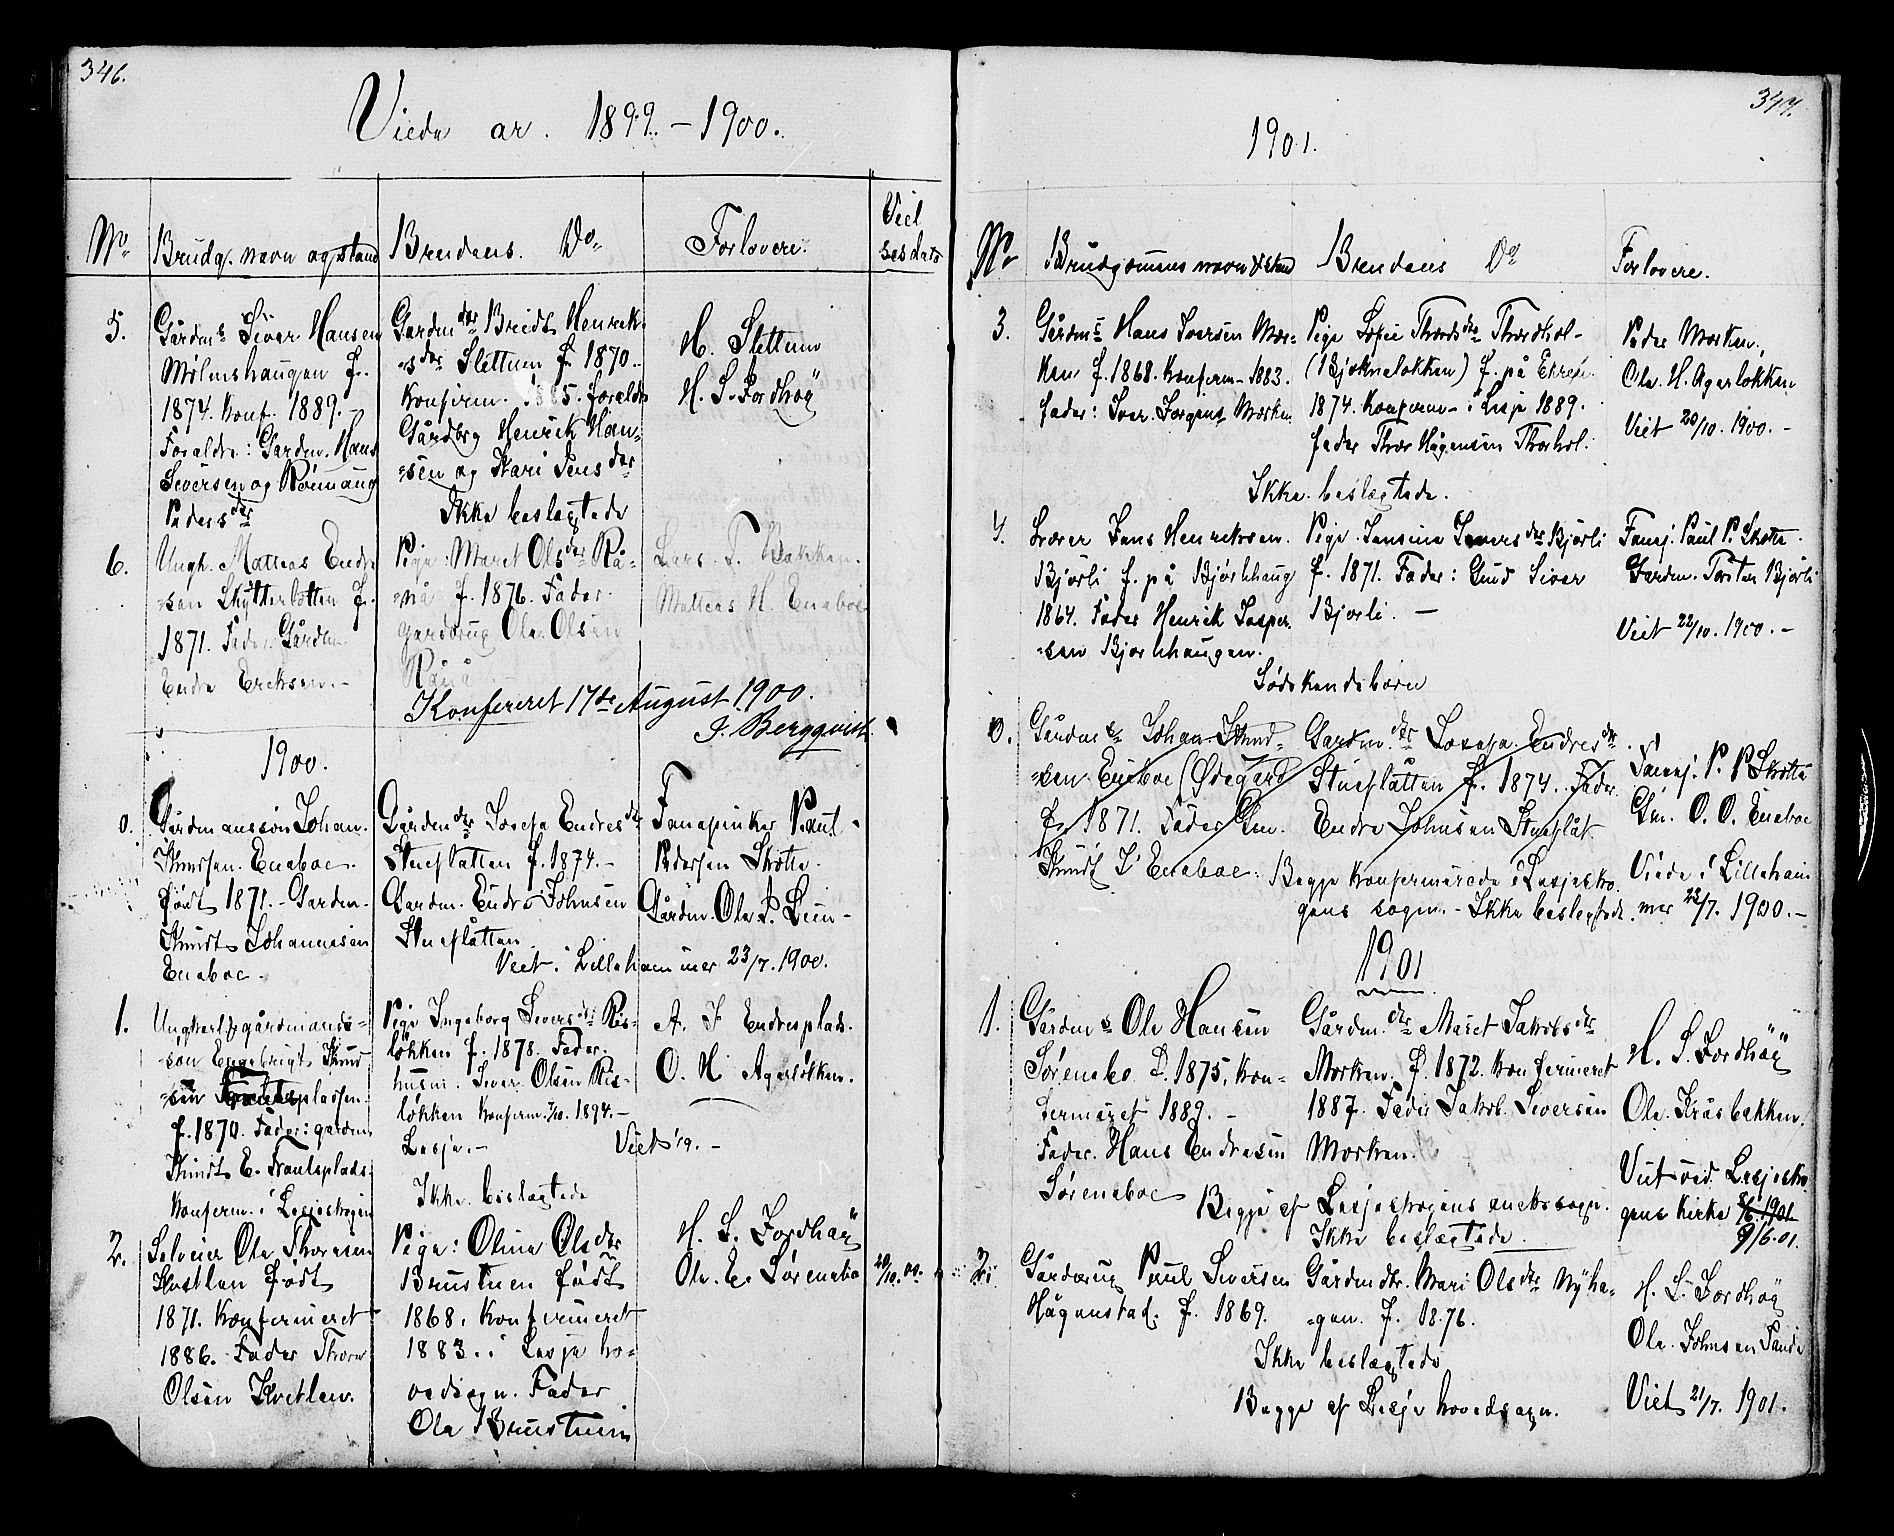 SAH, Lesja prestekontor, Klokkerbok nr. 6, 1871-1904, s. 346-347